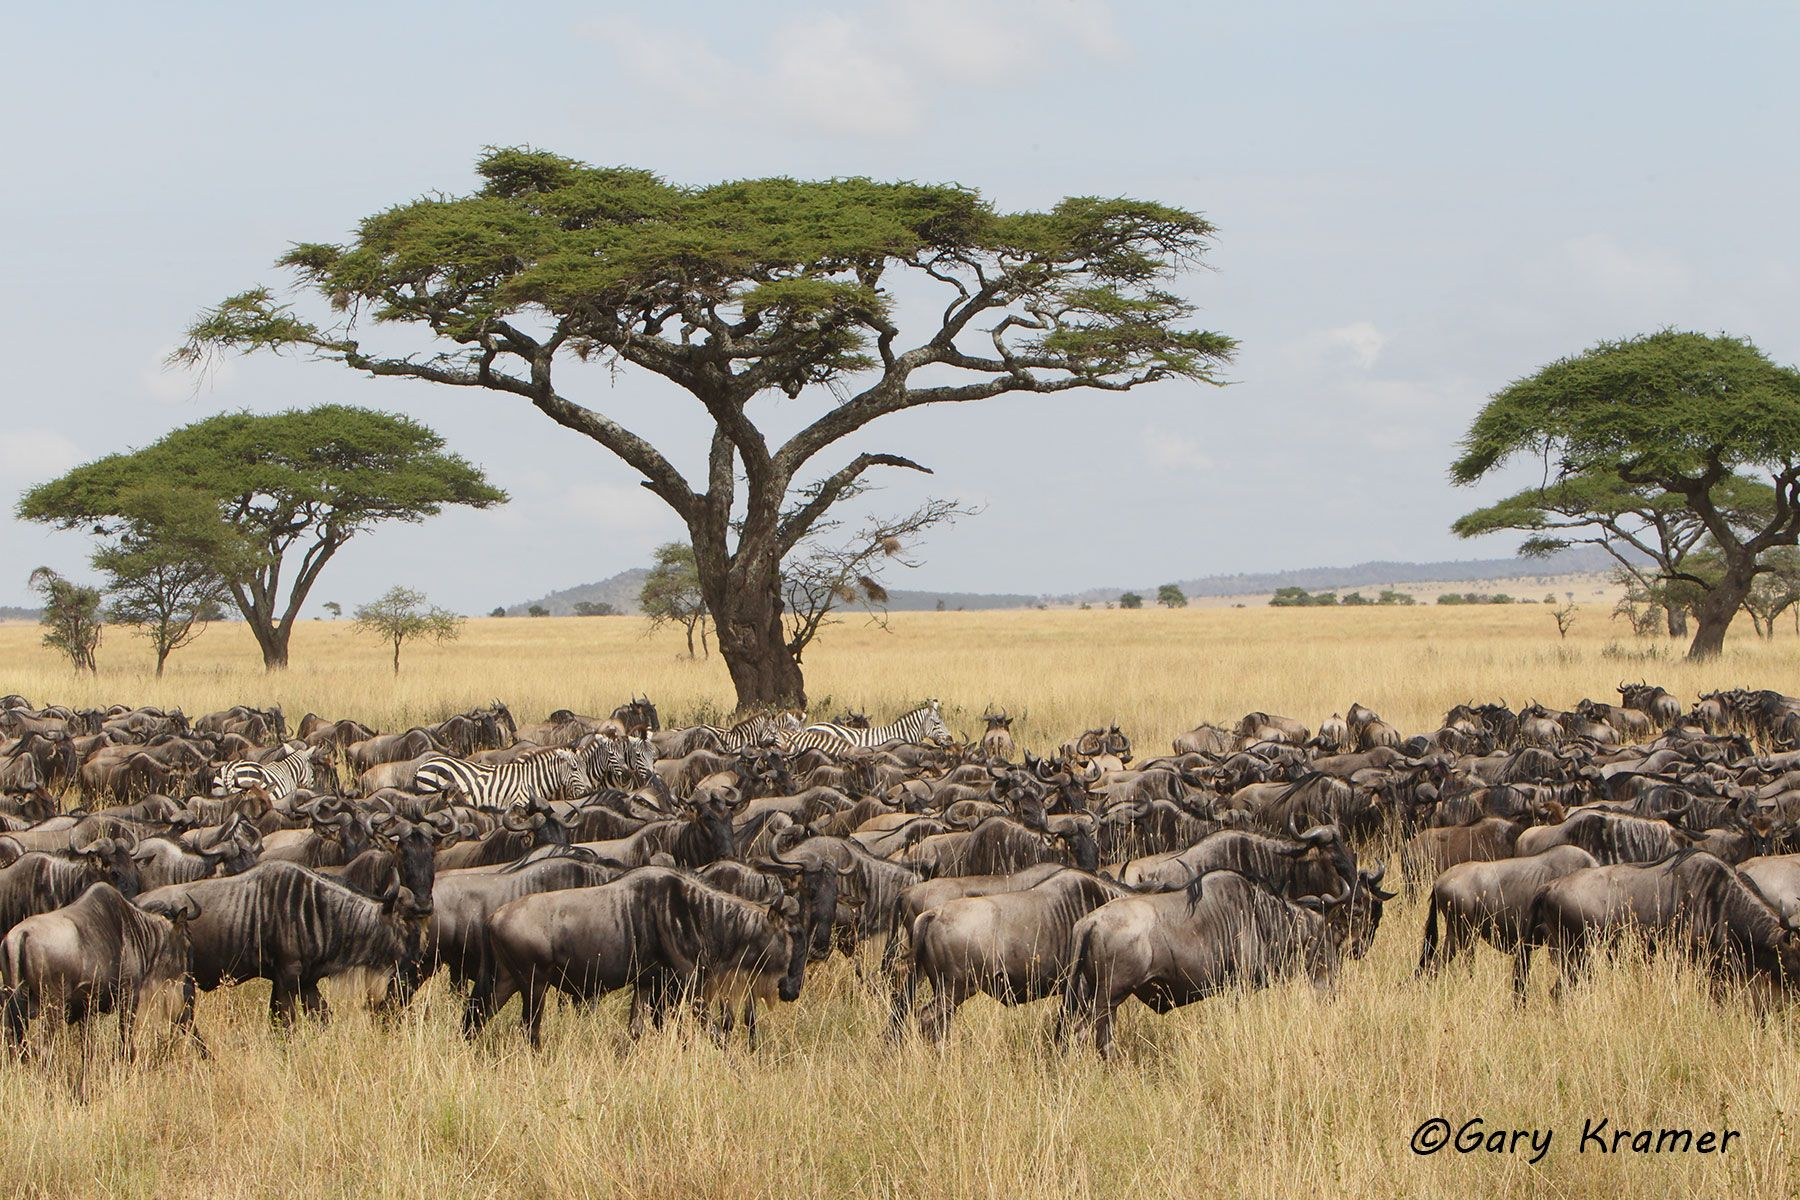 AWildebeest/Plains Zebra (C. taurinus/Equus quagga) Maasai Mara N. R. Kenya - MUBZ#032d.jpg